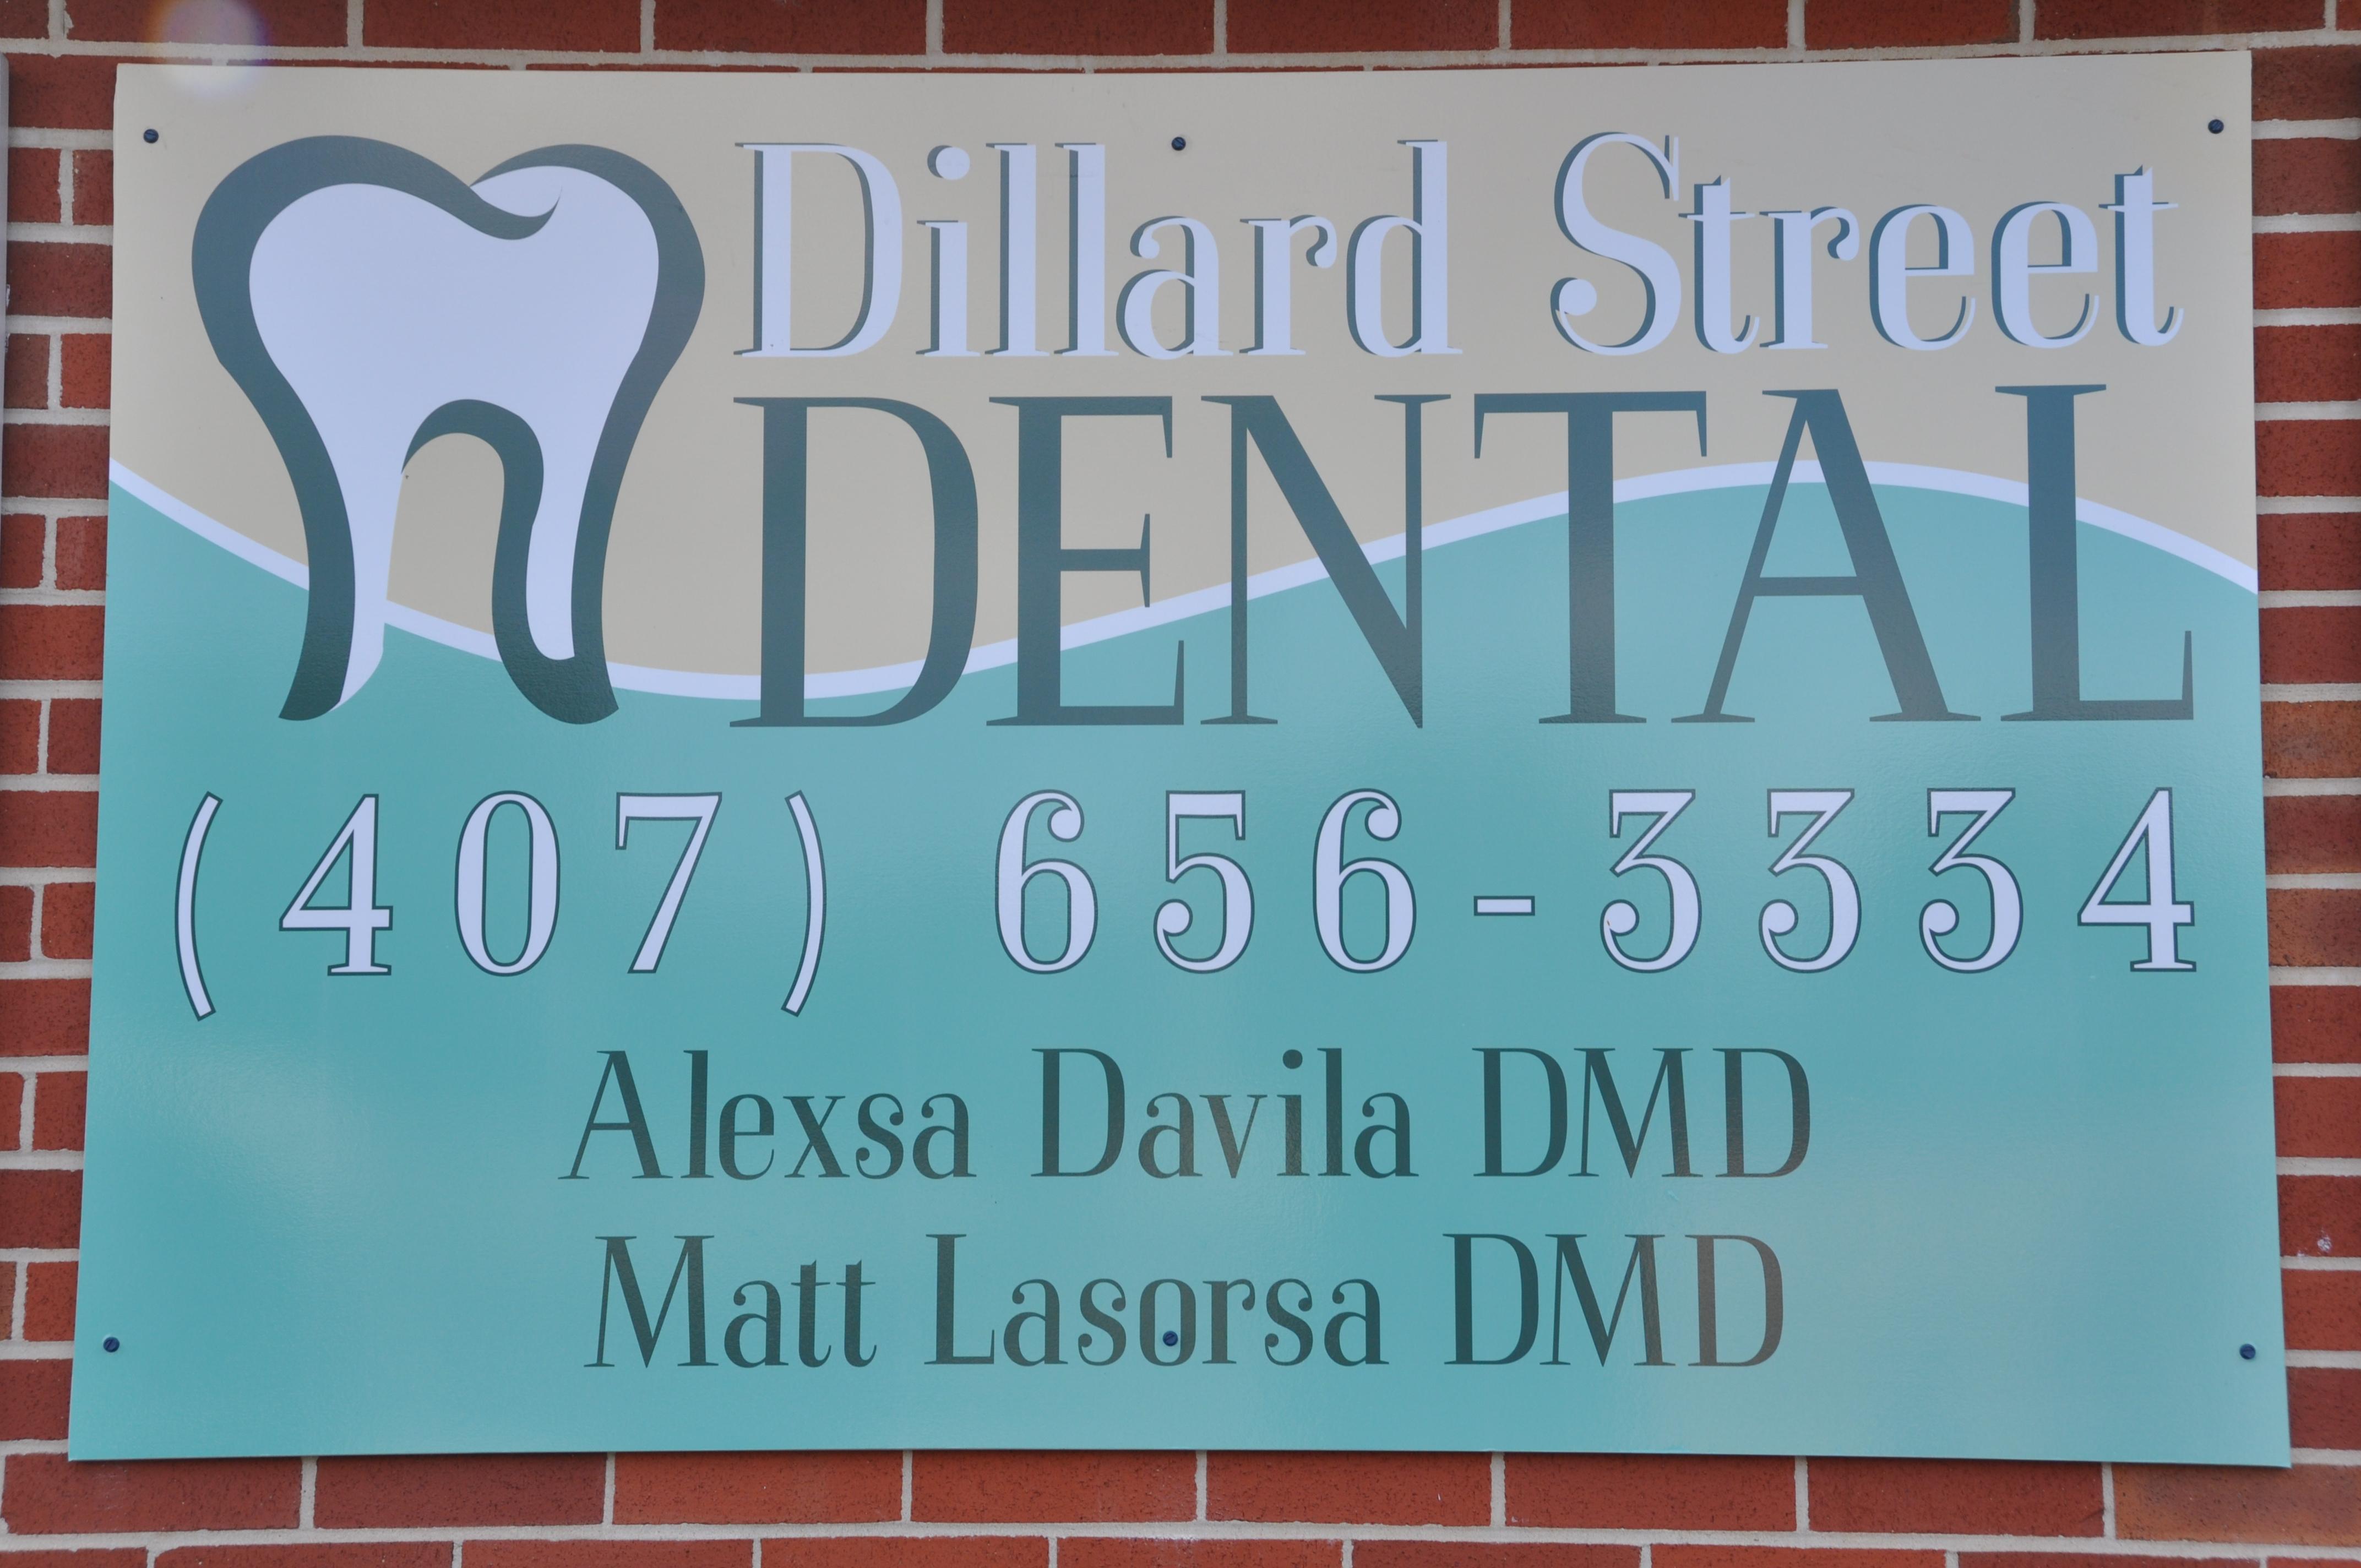 Dillard Street Dental 516 S Dillard St Winter Garden Fl